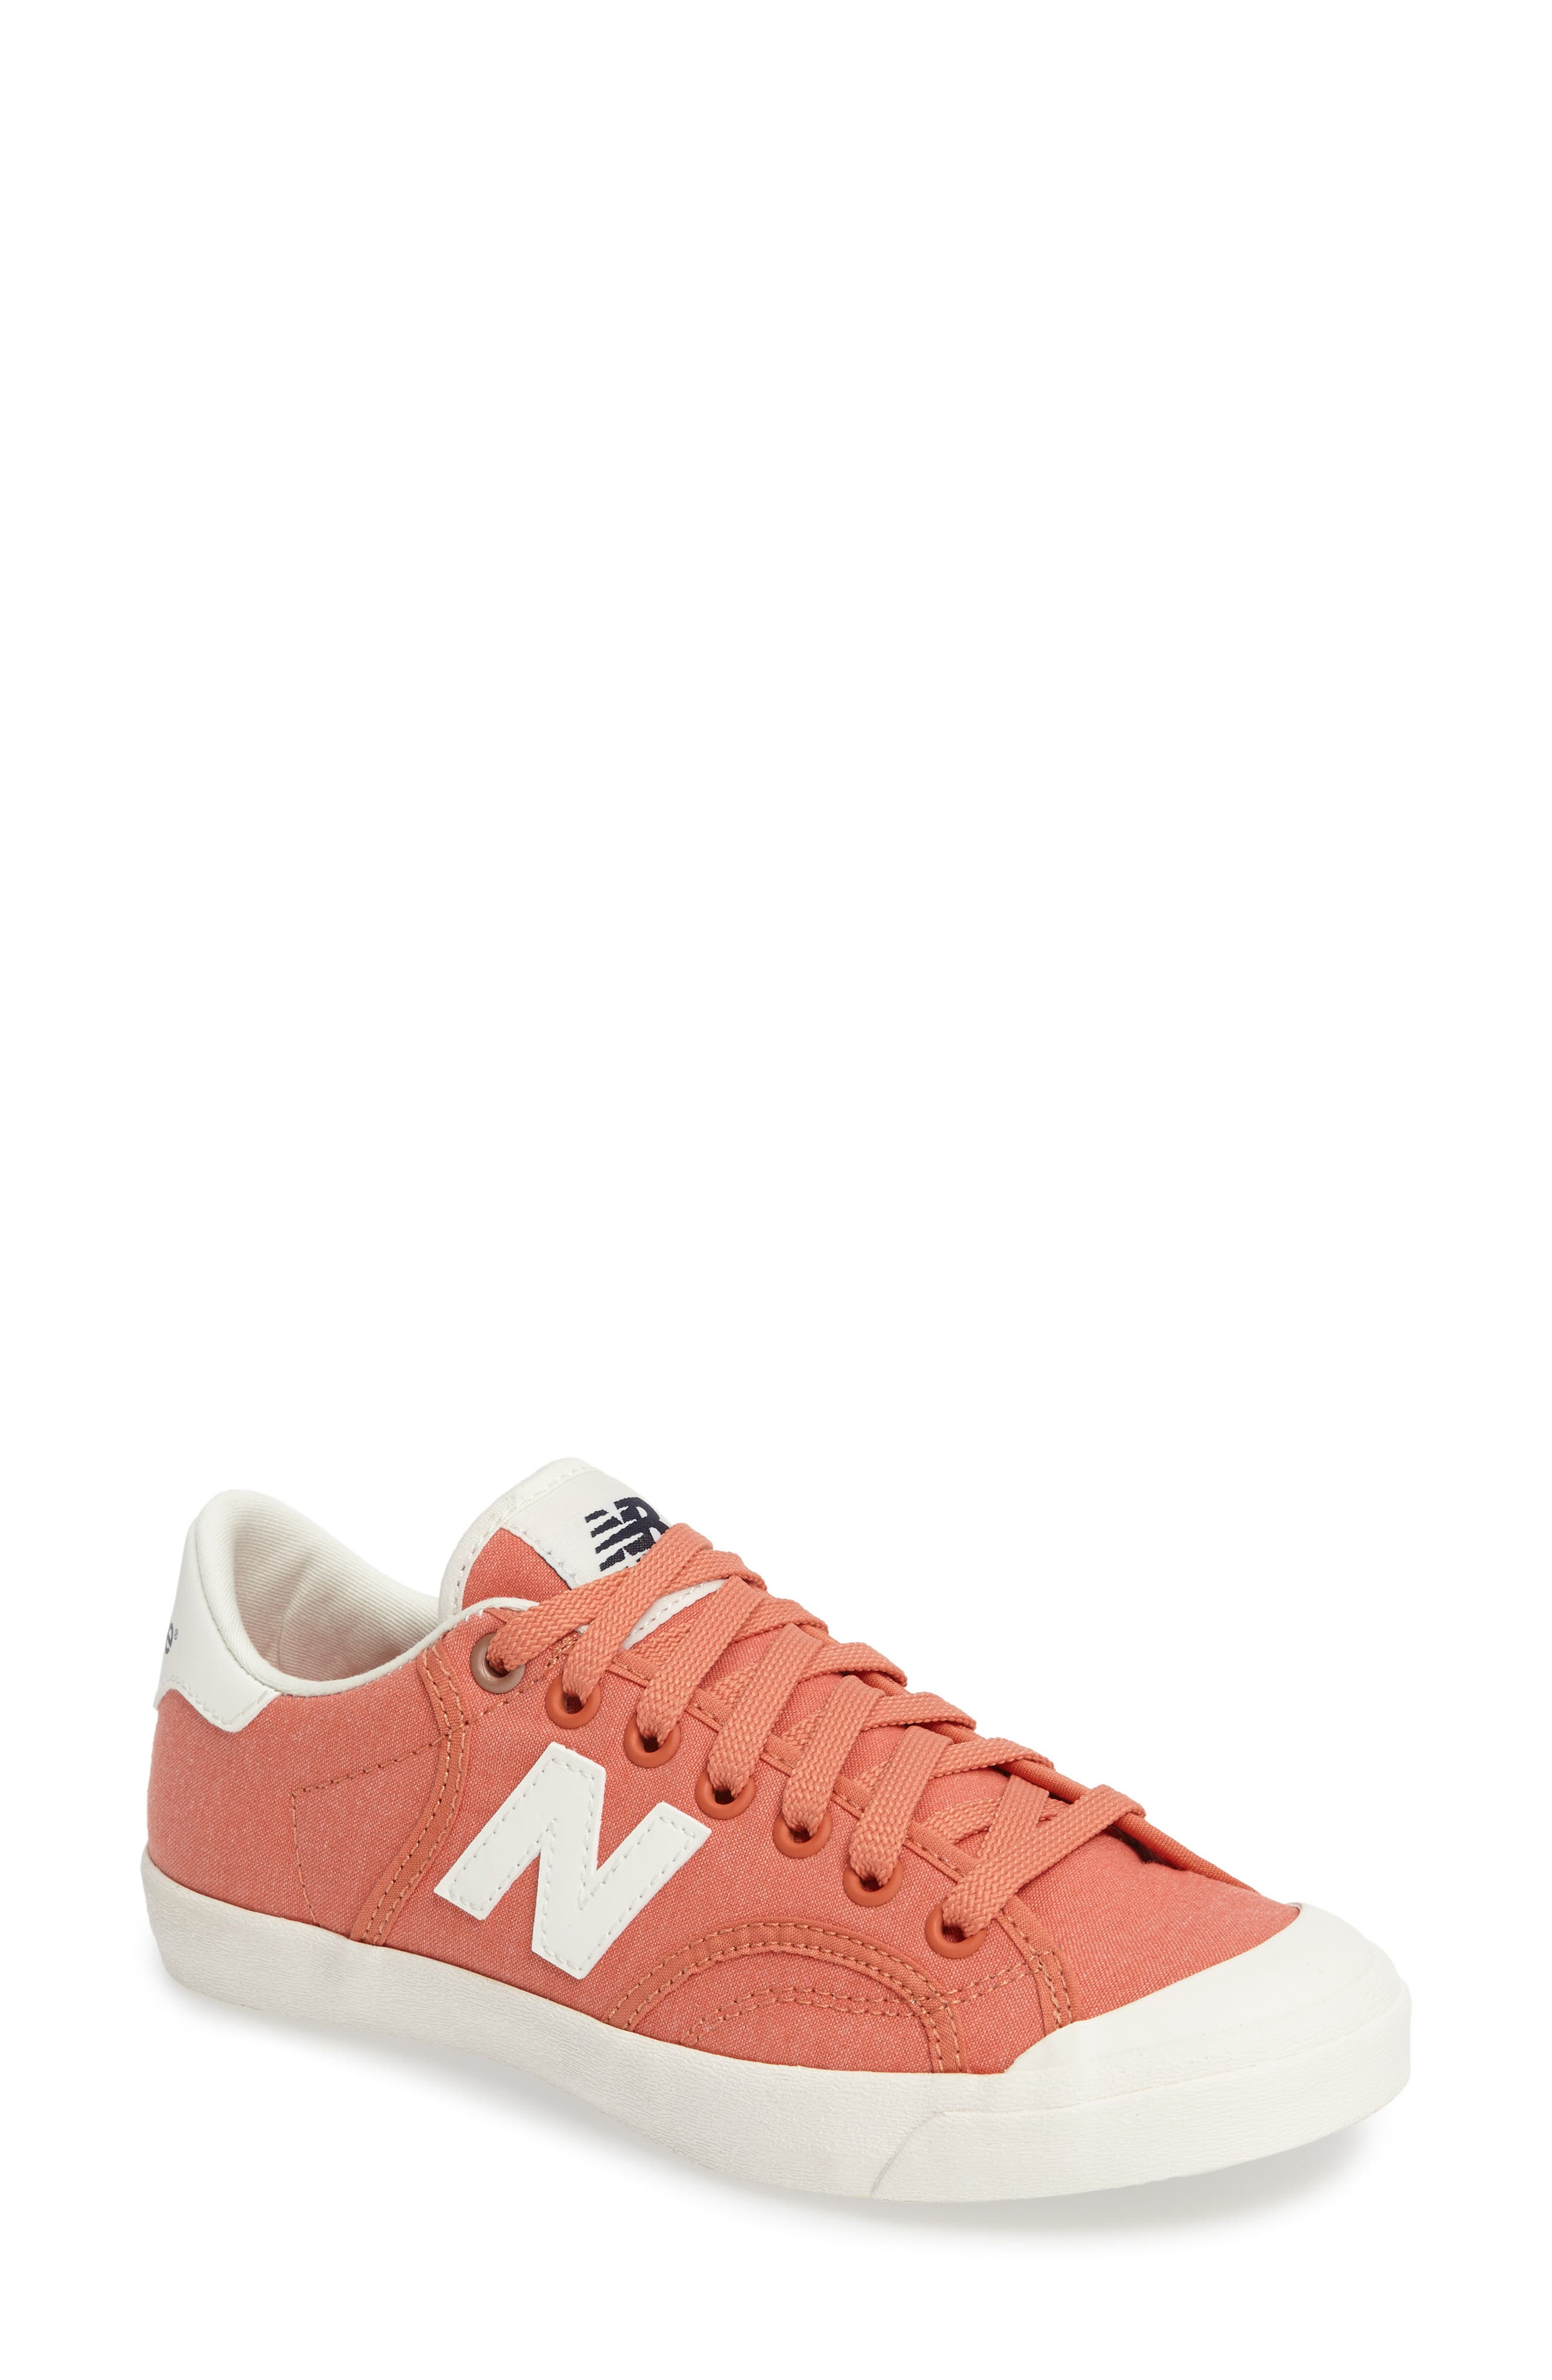 Alternate Image 1 Selected - New Balance Pro Court Sneaker (Women)